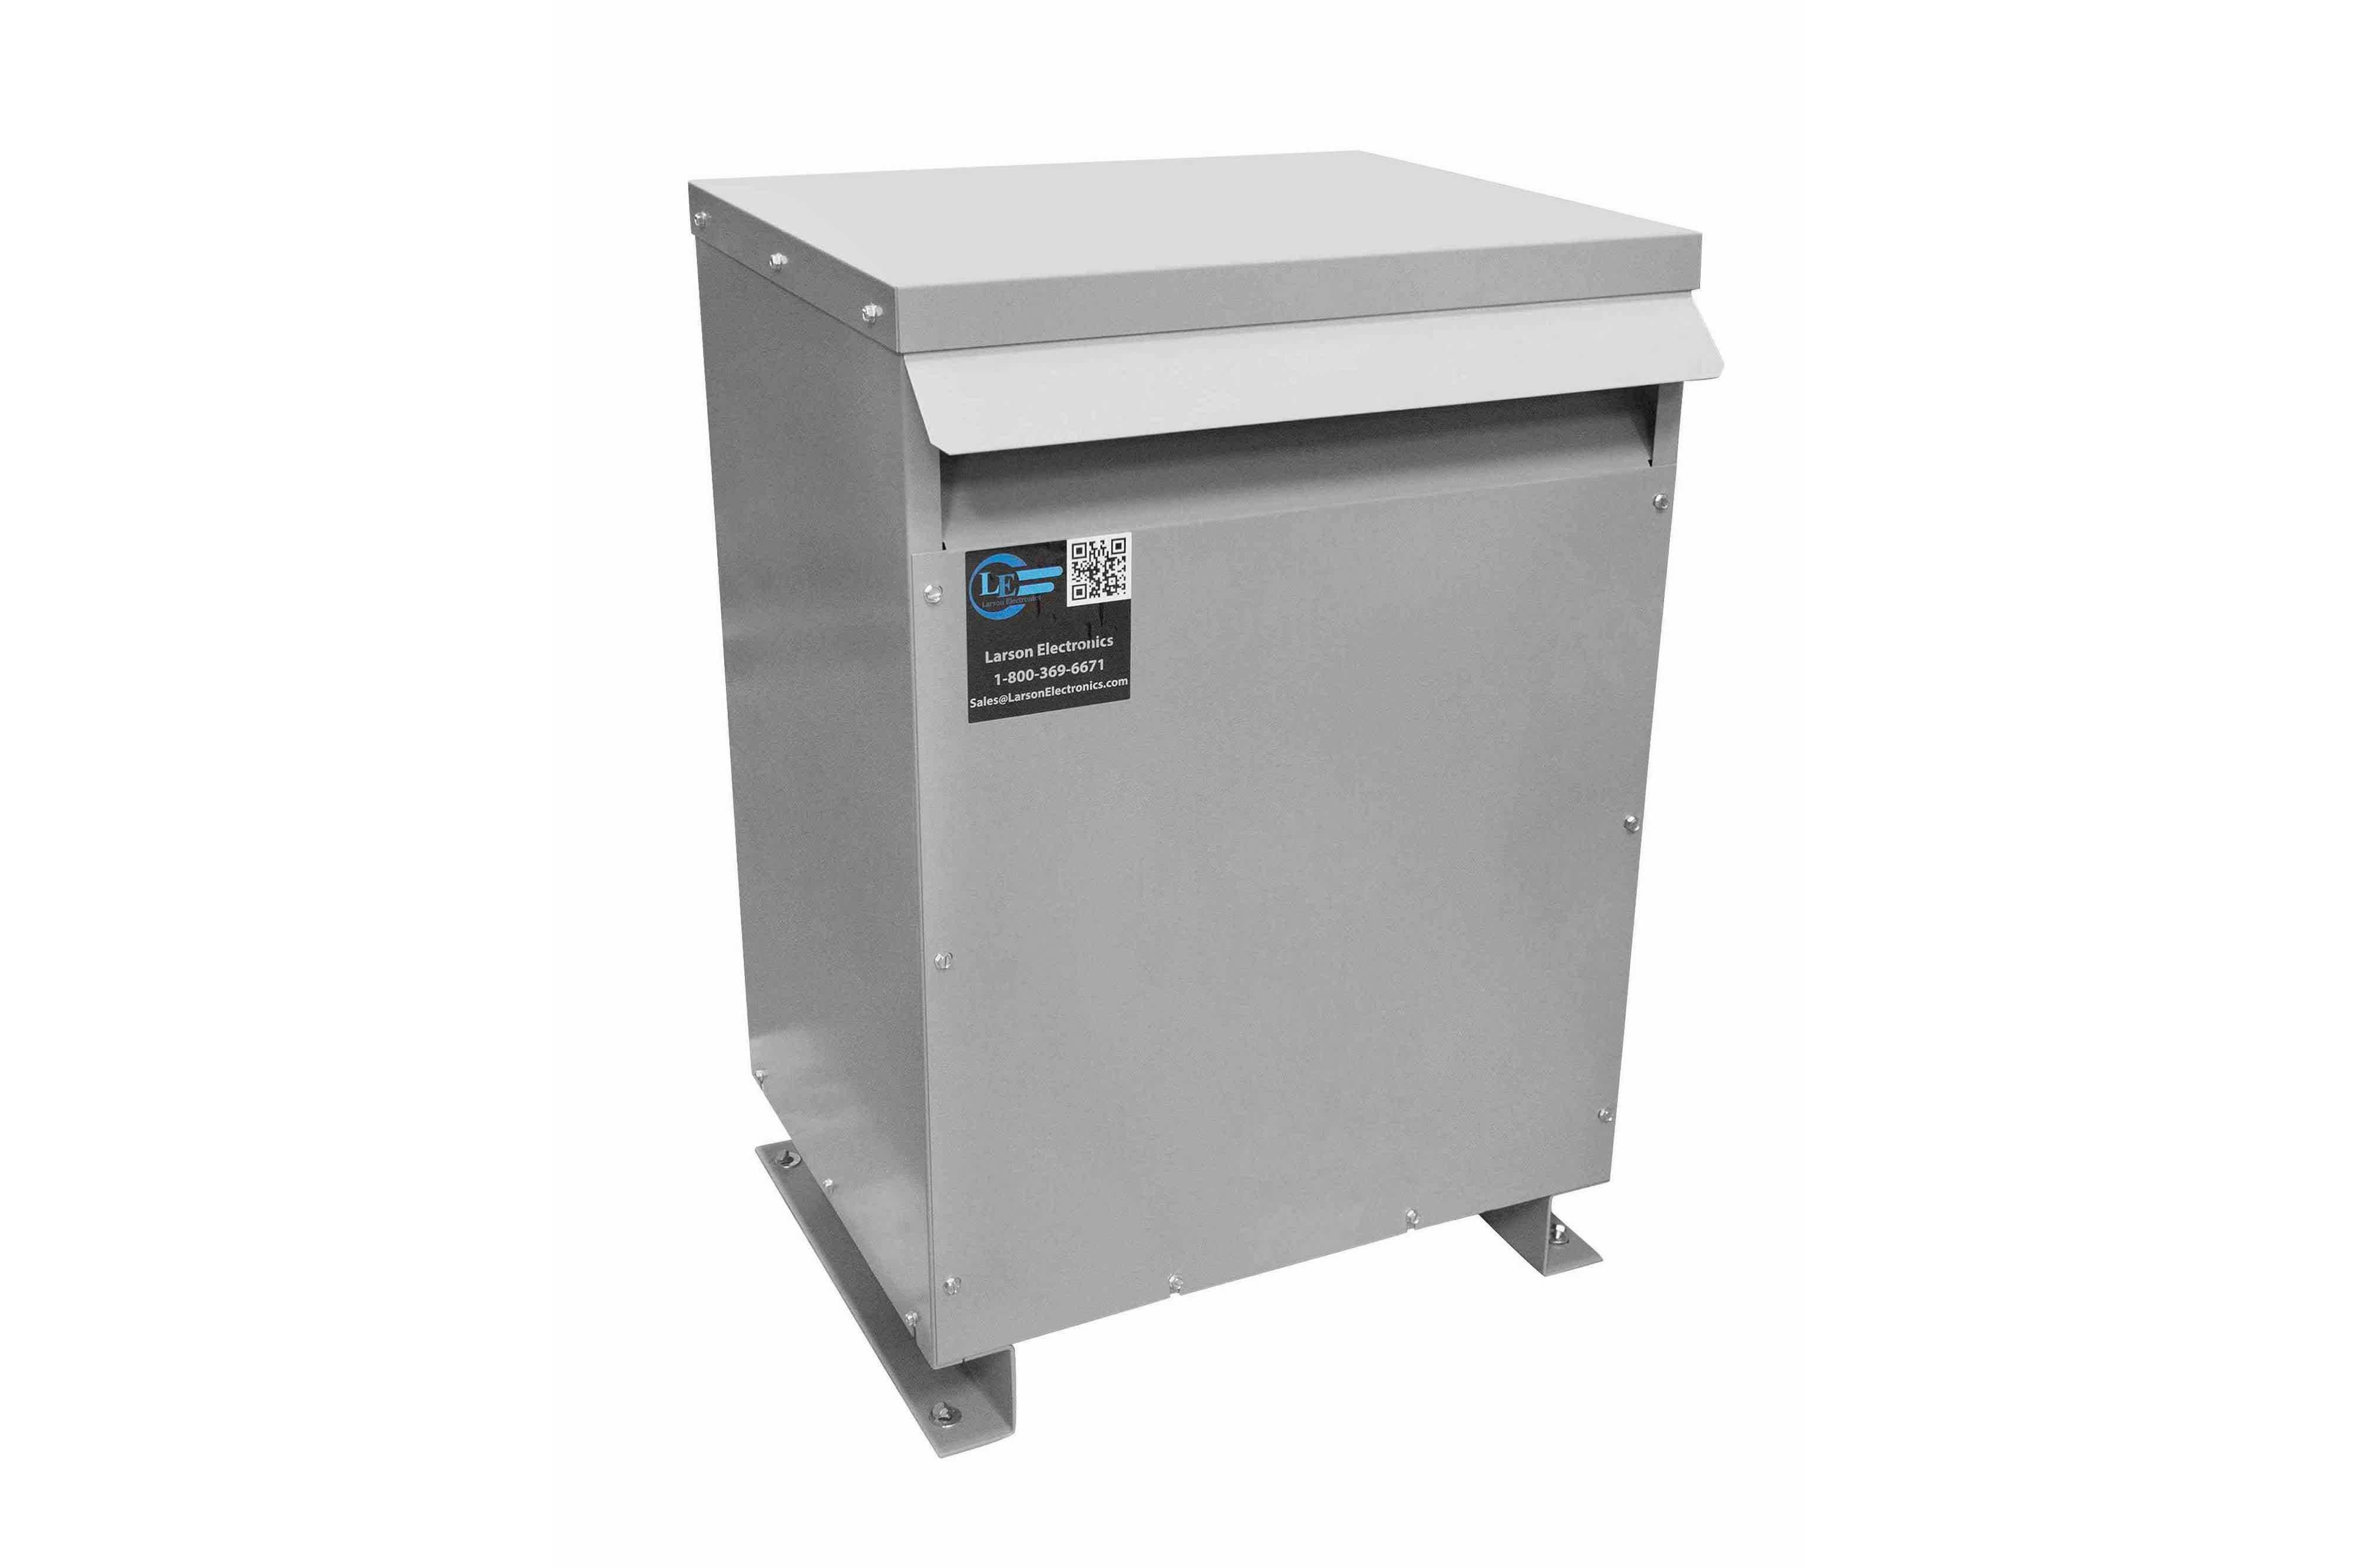 30 kVA 3PH Isolation Transformer, 415V Wye Primary, 208Y/120 Wye-N Secondary, N3R, Ventilated, 60 Hz